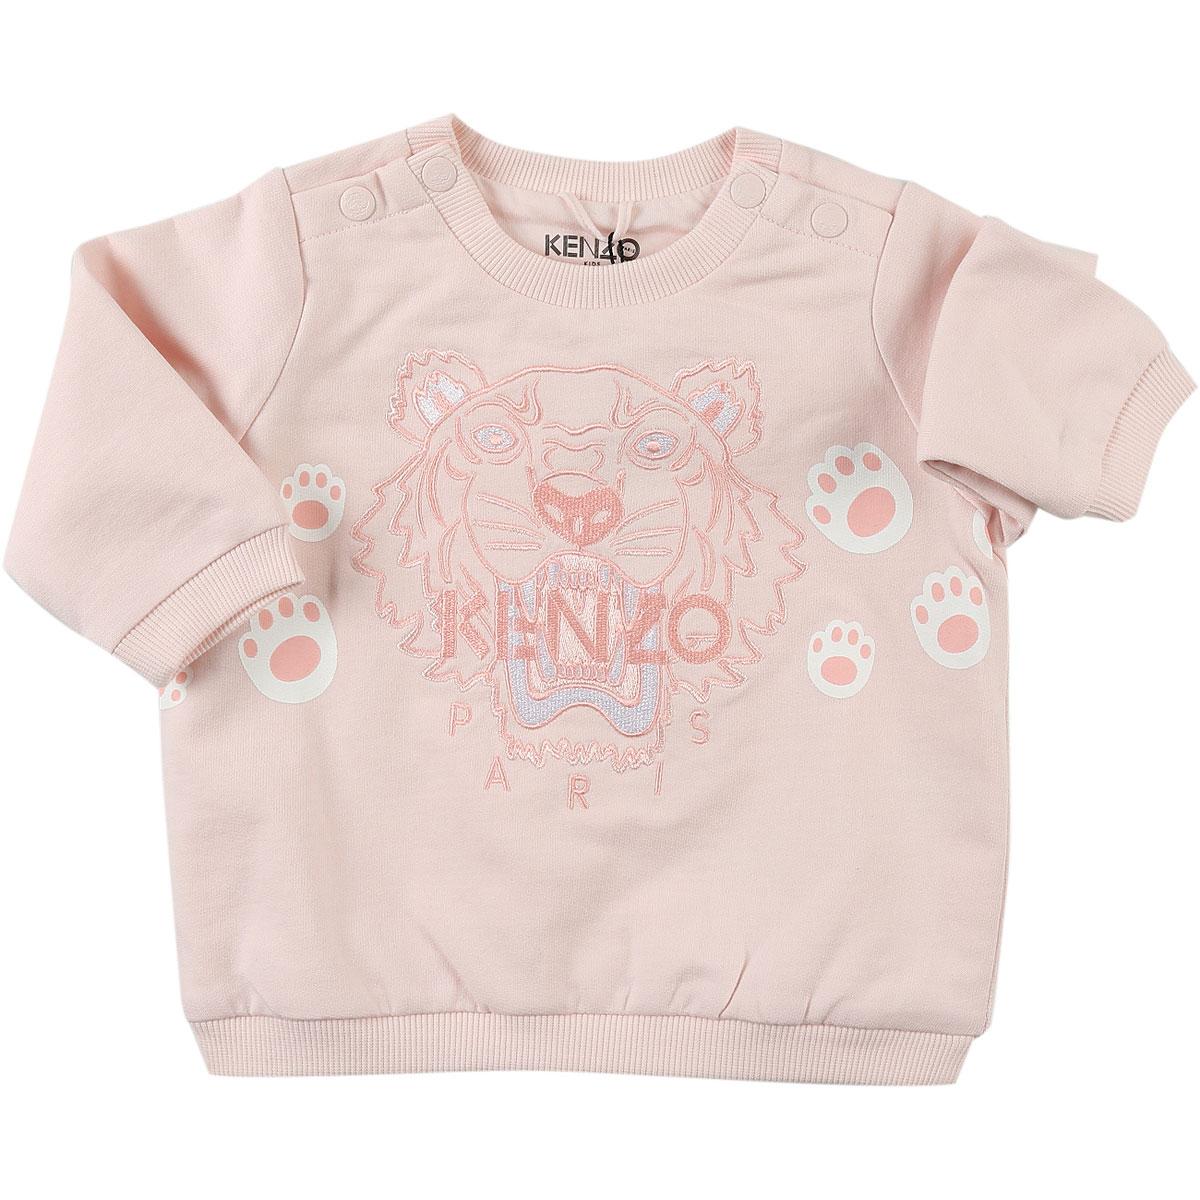 Image of Kenzo Baby Sweatshirts & Hoodies for Girls, Pink, Cotton, 2017, 12M 18M 2Y 6M 9M